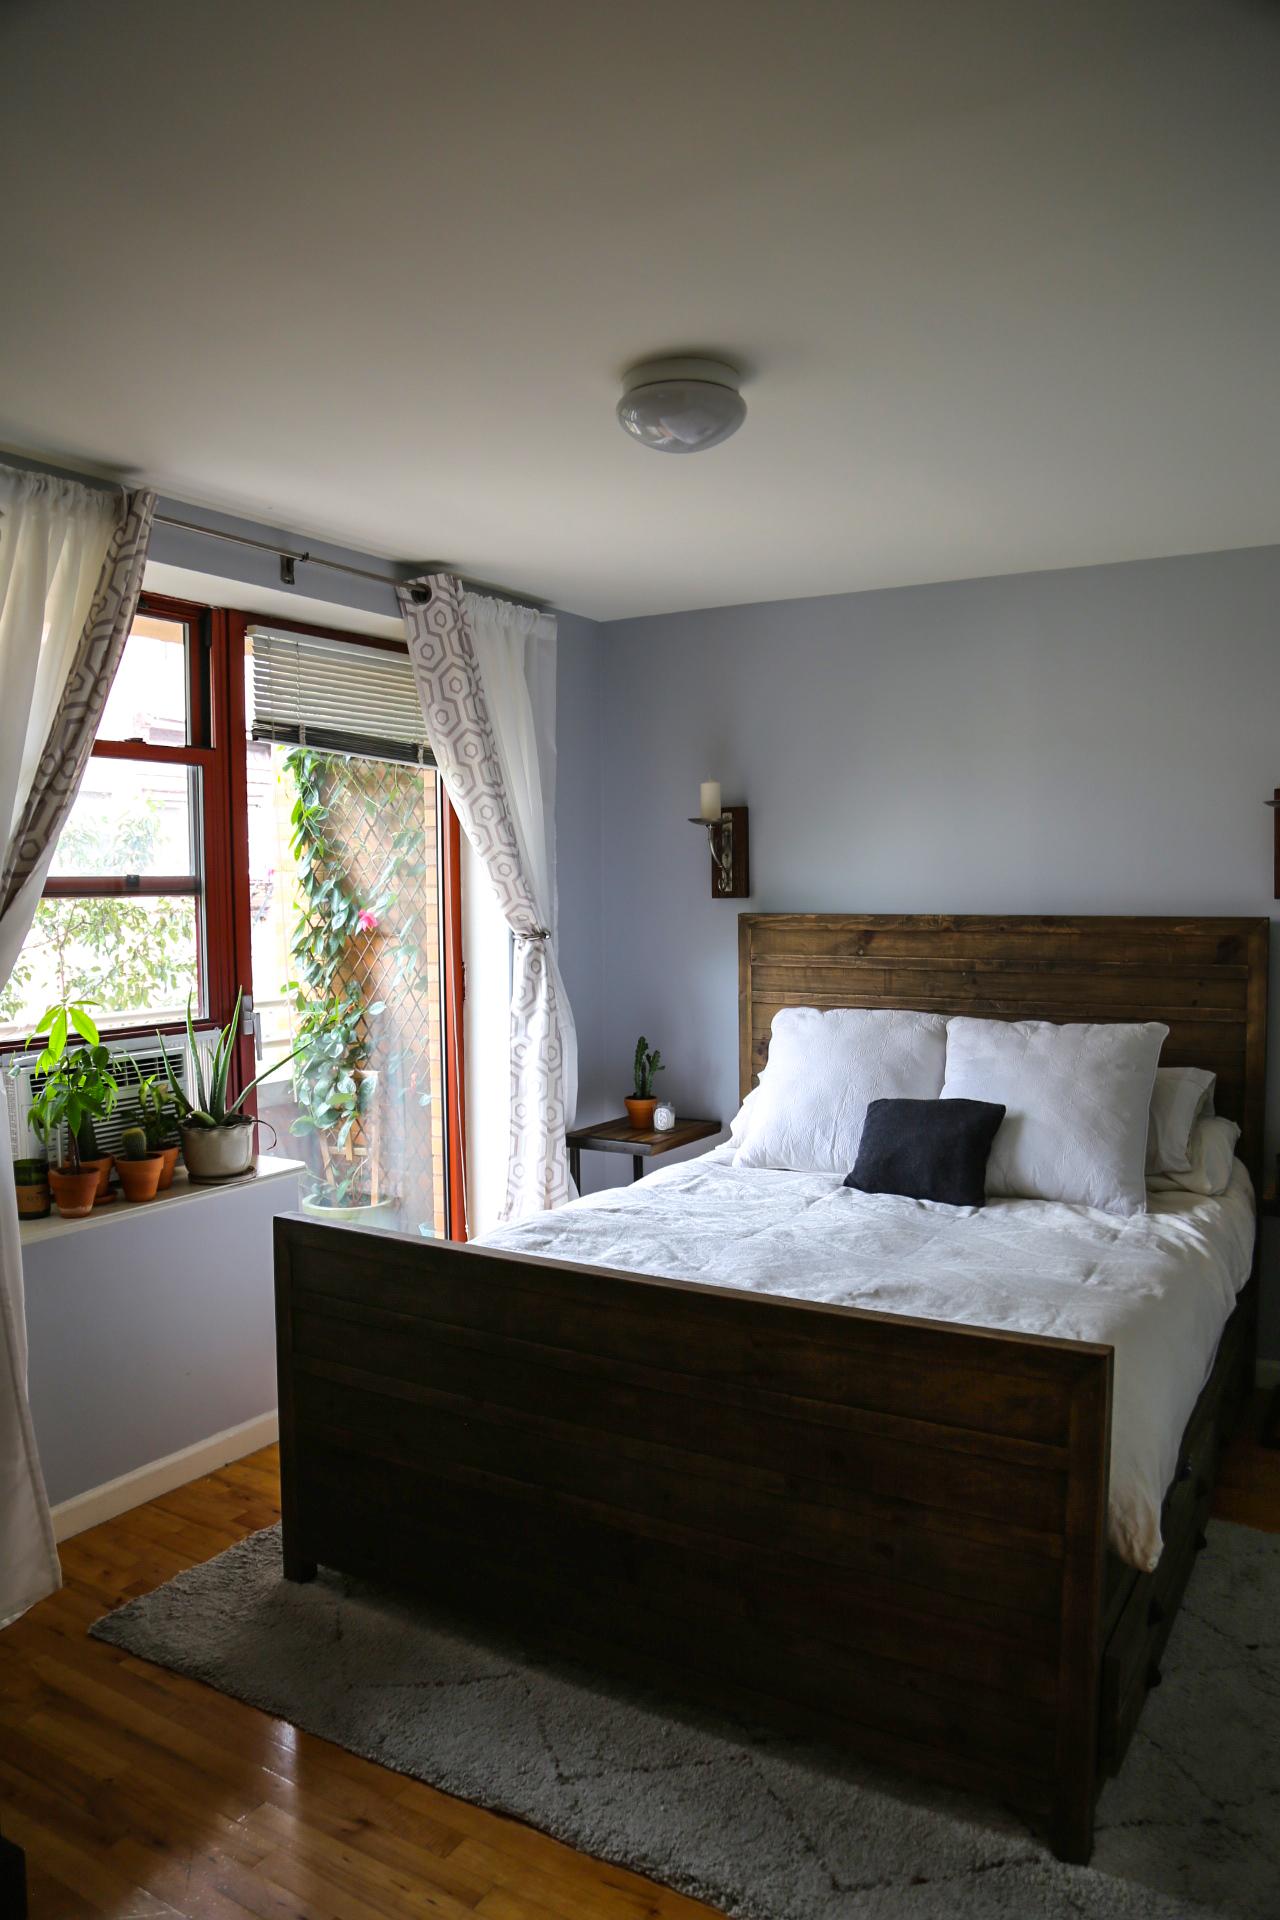 1bedroom-bedroompic.jpg